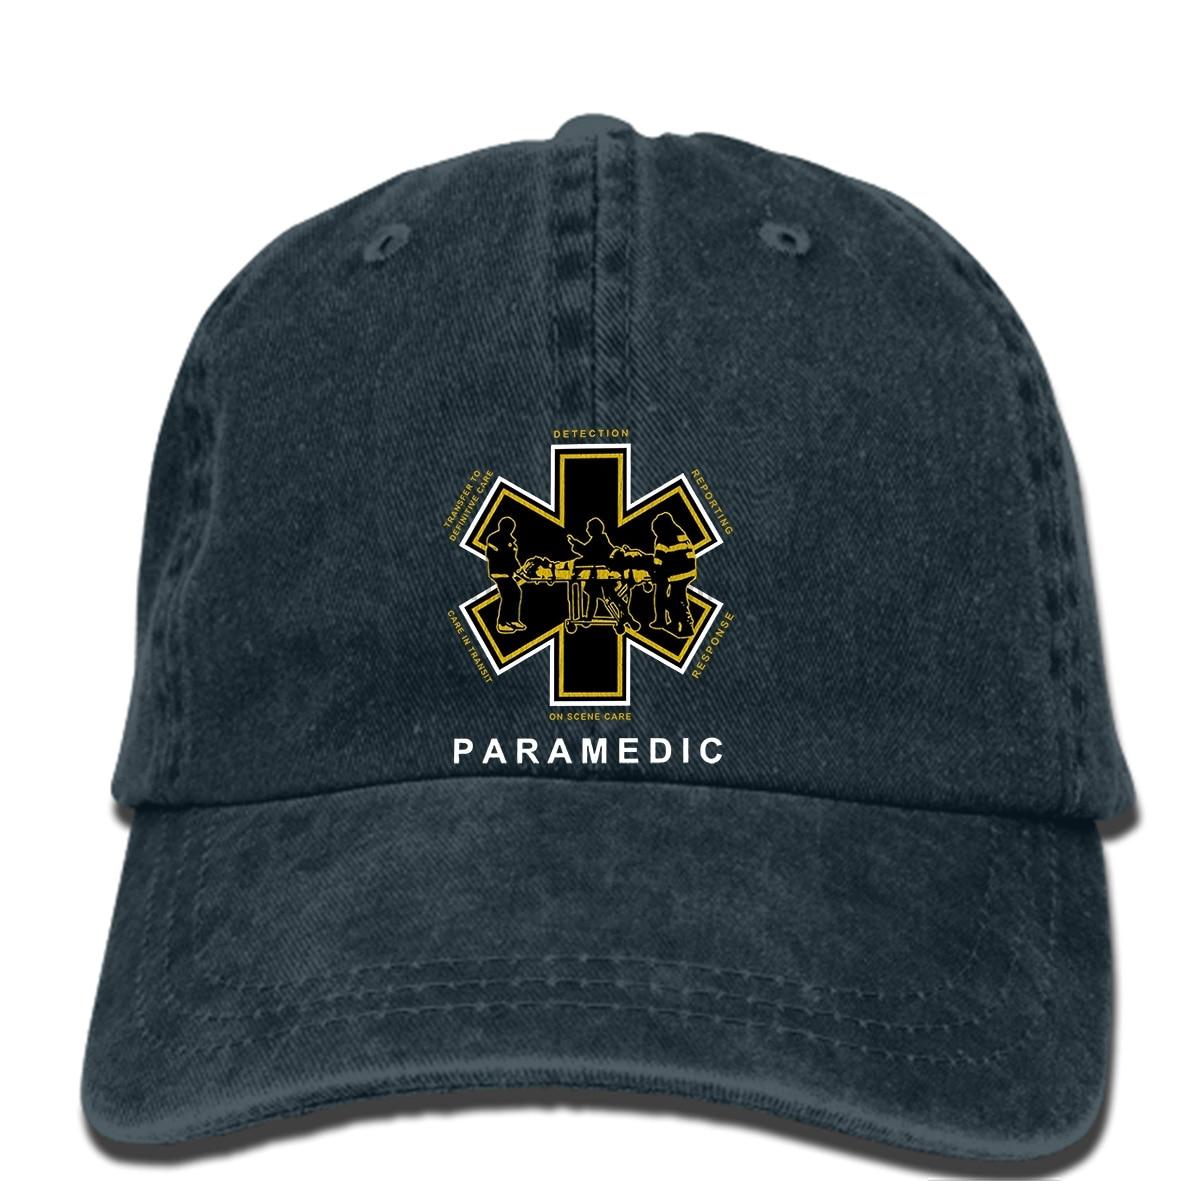 42a8e74a91a Detail Feedback Questions about hip hop Baseball caps New Proud Paramedic  EMT Emergency Medical Technician Medic Rescue Graphic cap on Aliexpress.com  ...